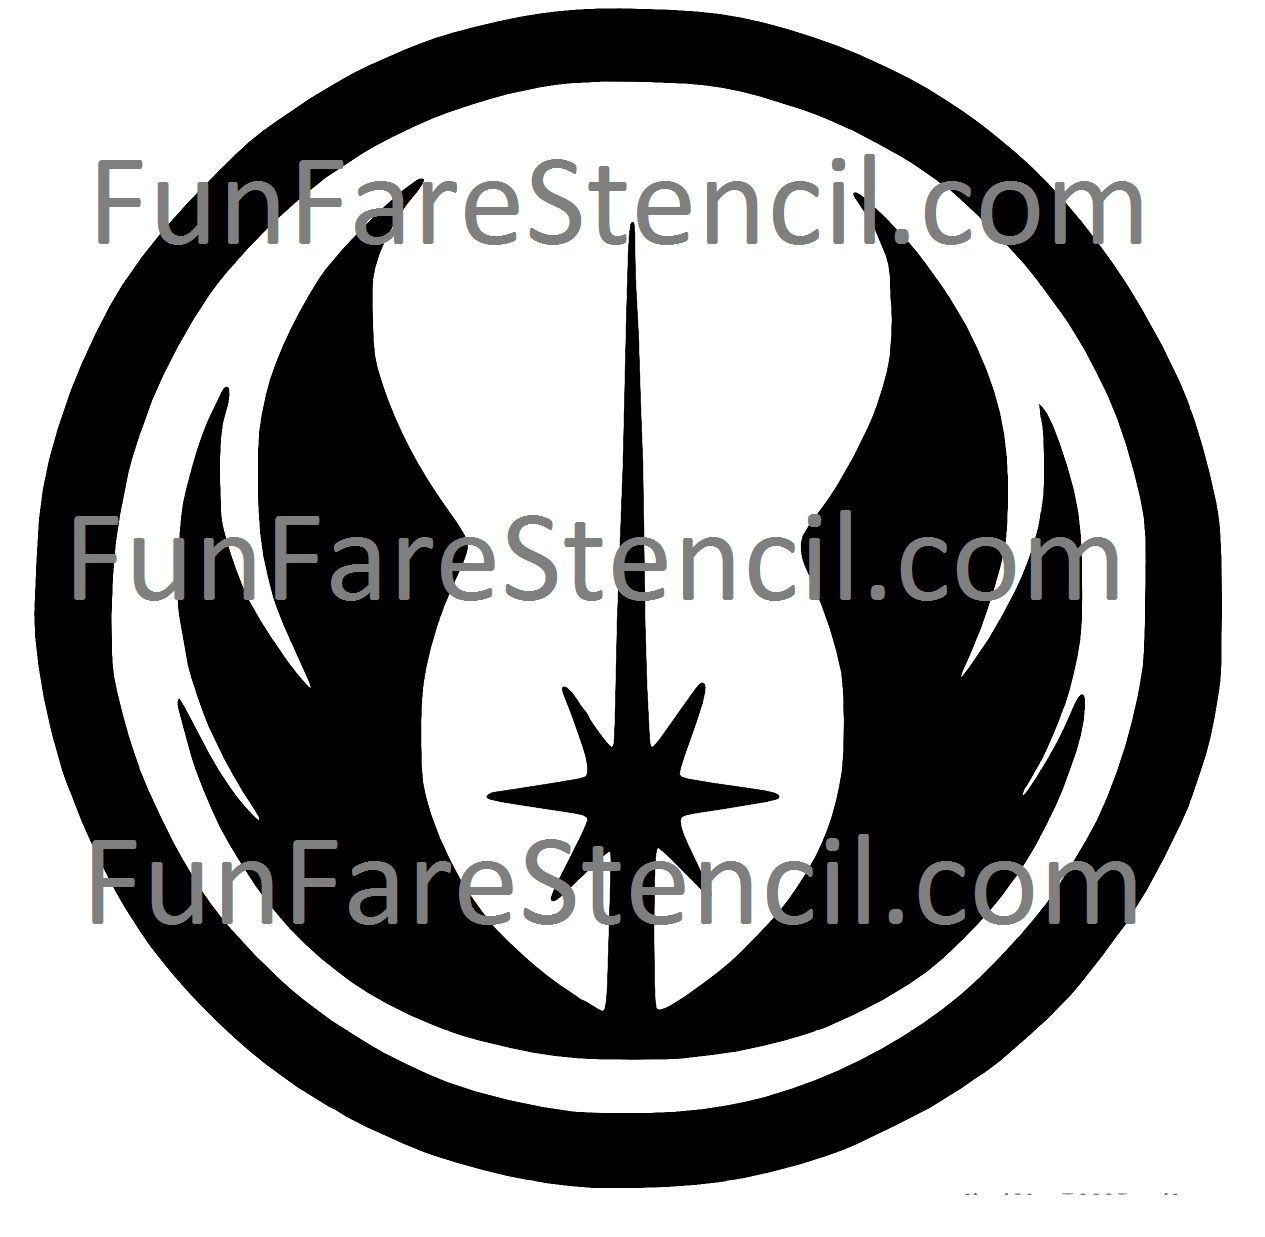 Logo clipart jedi Vinyl Decal Jedi Order